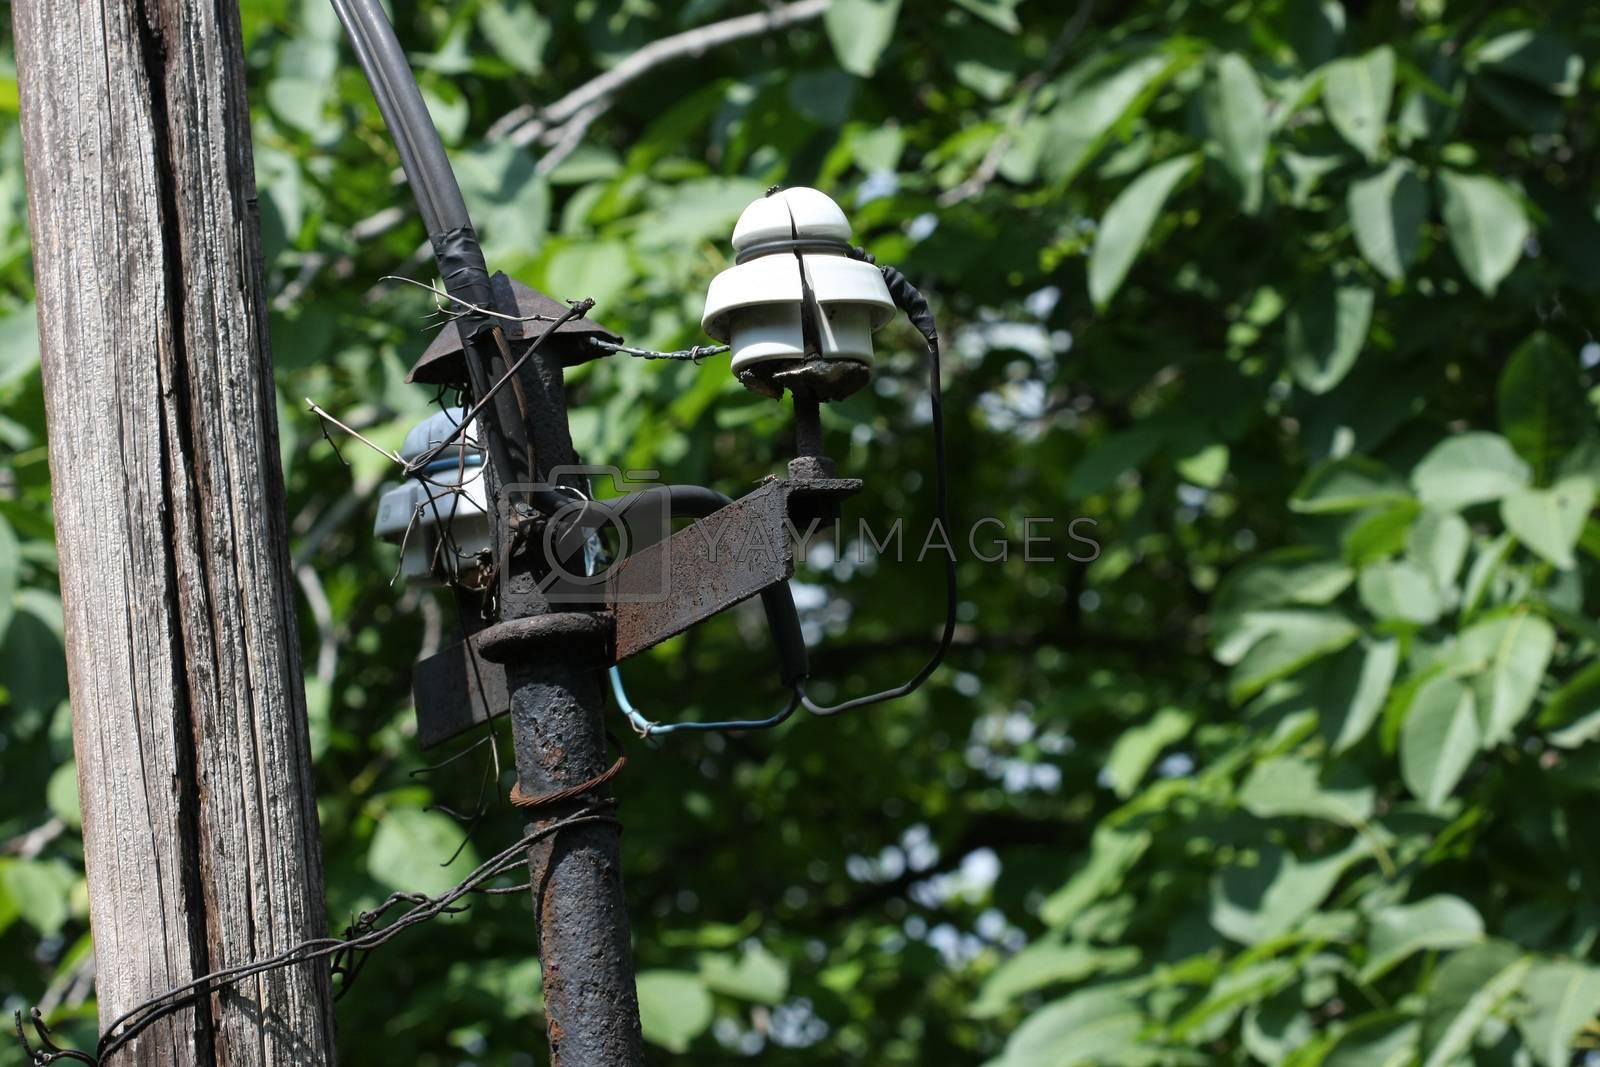 Affrightfu old electric installation still in use